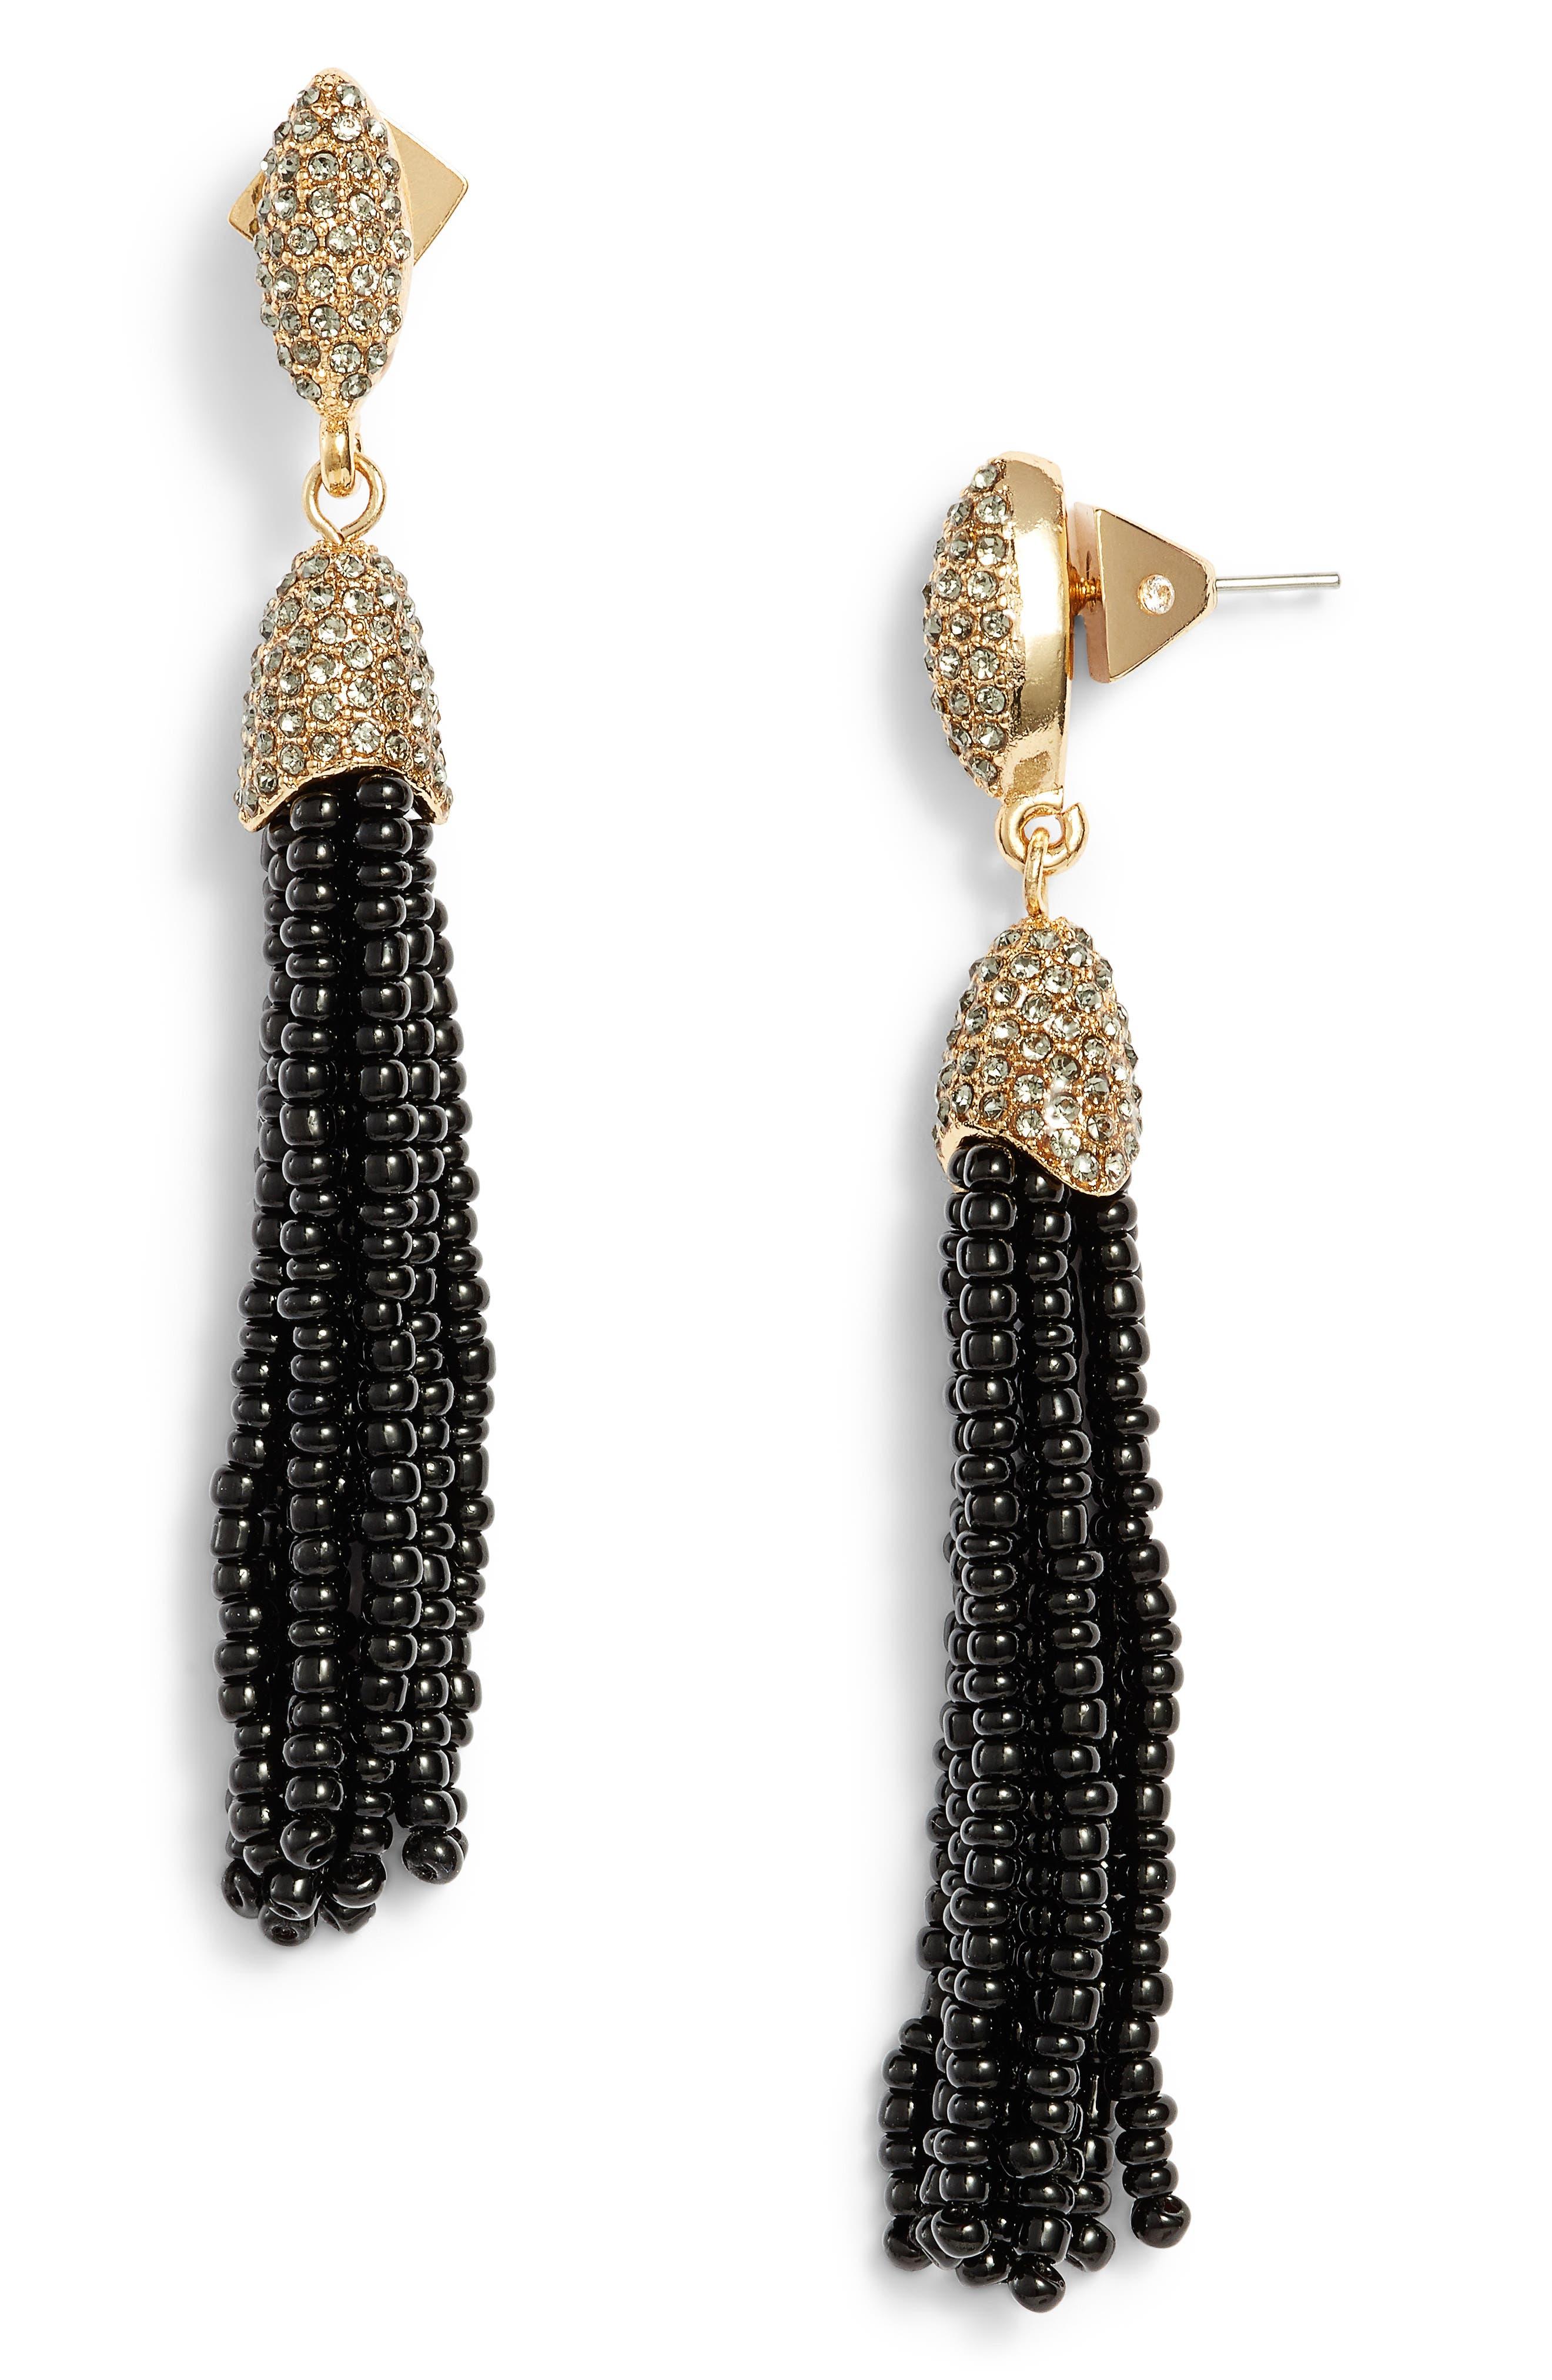 Seed Bead Tassel Earrings,                             Main thumbnail 1, color,                             Gold